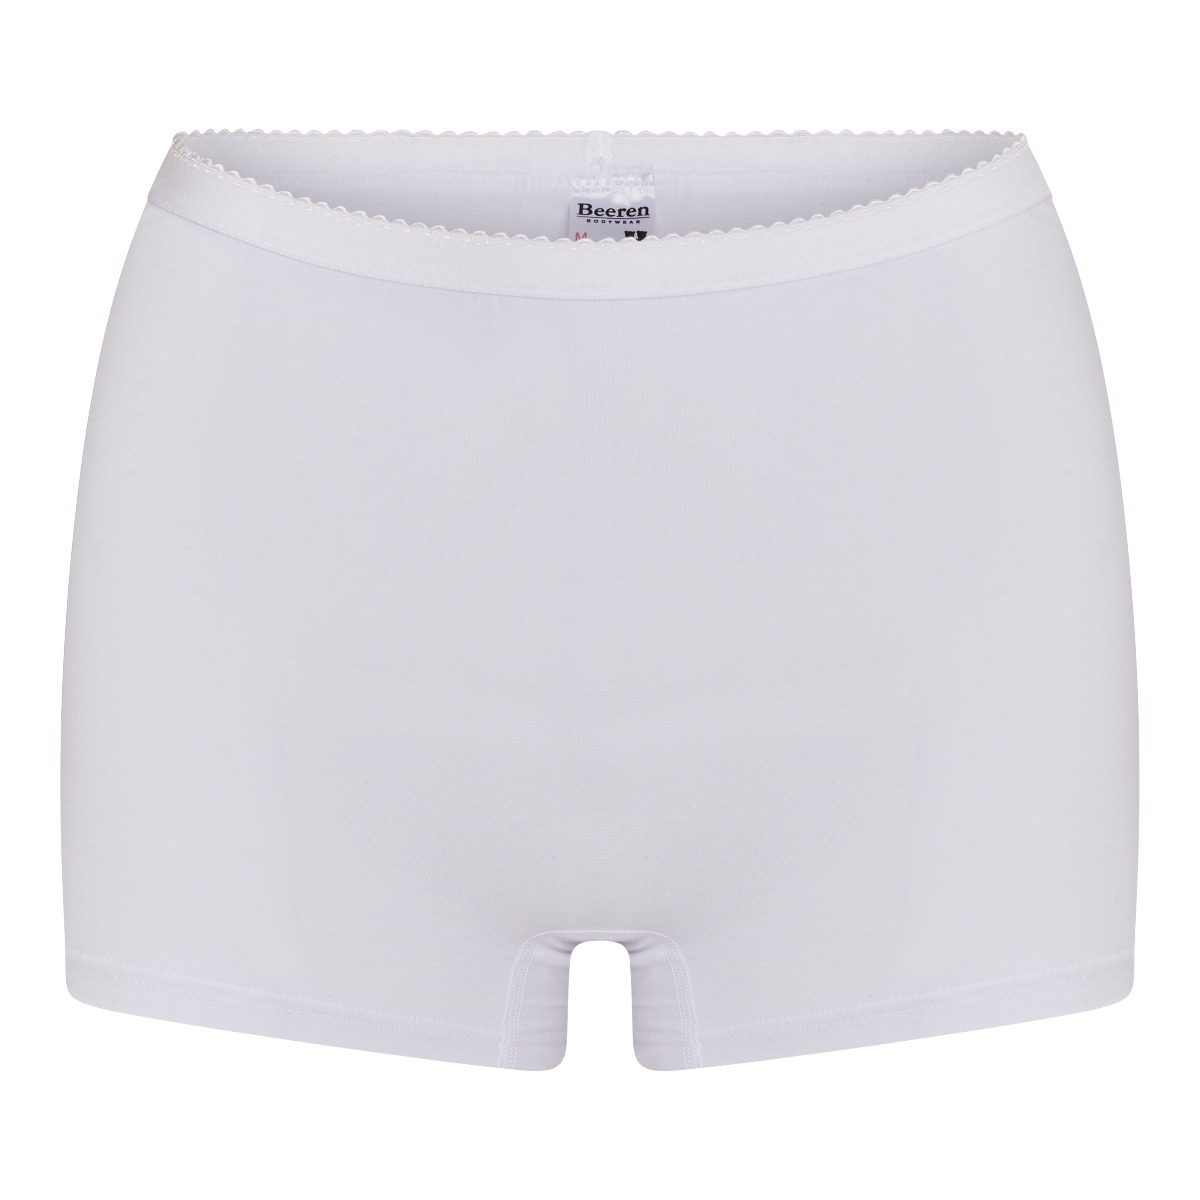 Beeren Softly Dames Panty Wit L